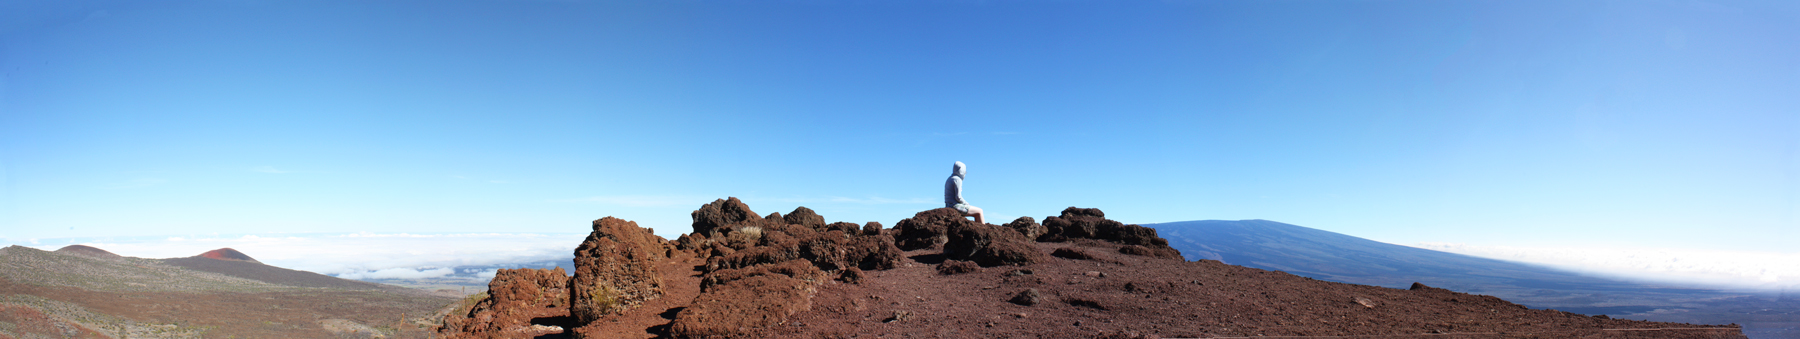 Alone Atop Mauna Kea by lwcldylan